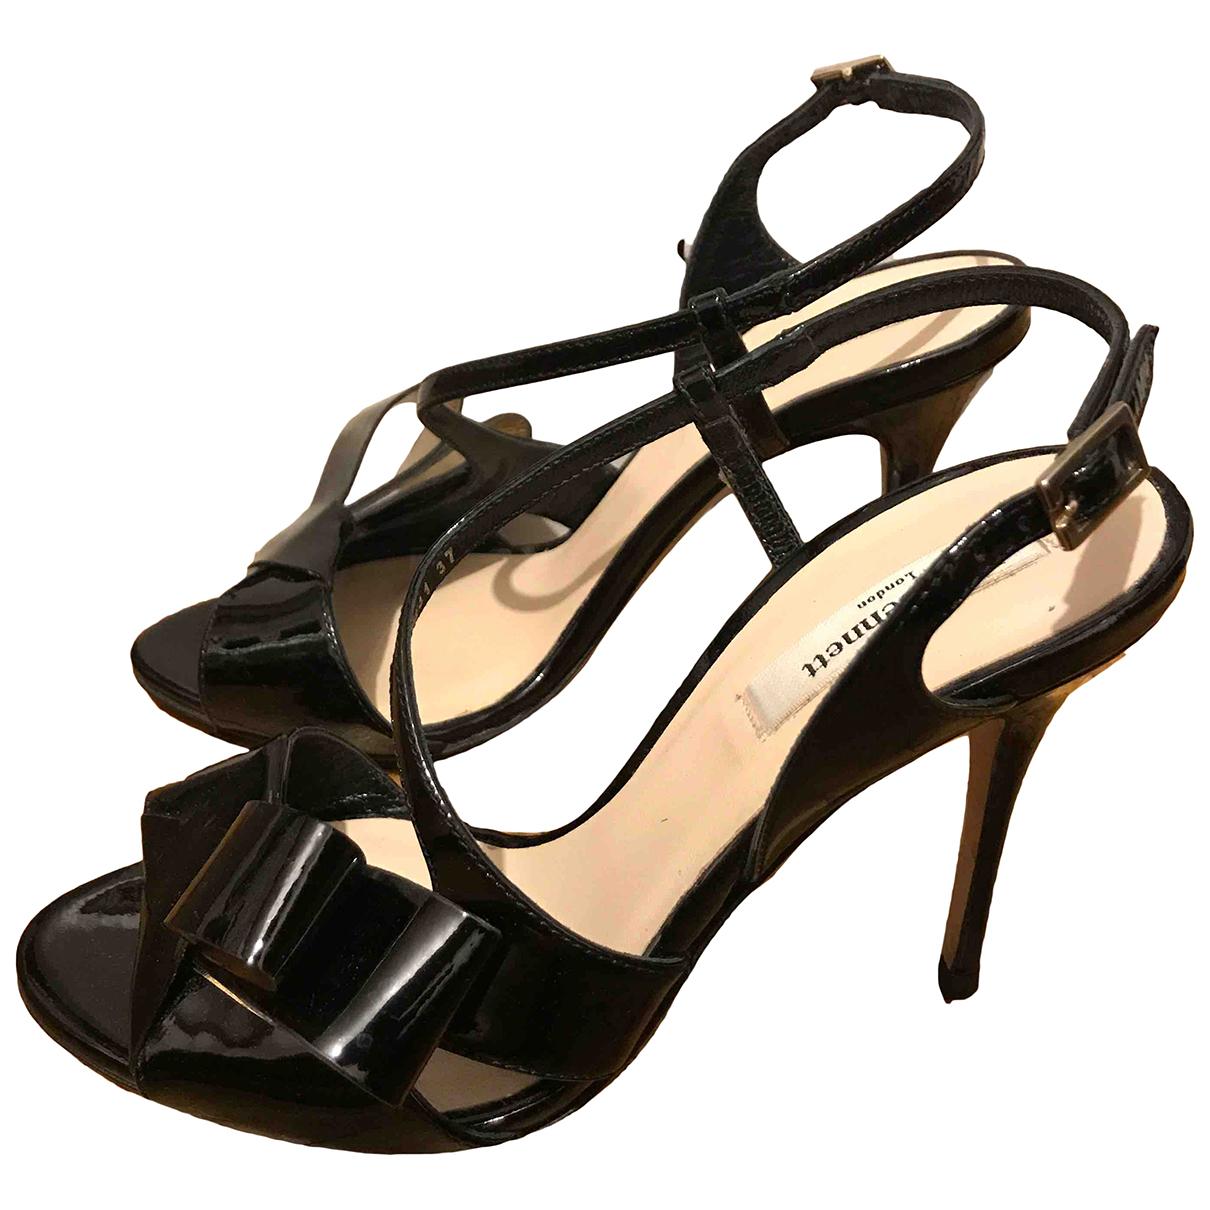 Lk Bennett - Escarpins   pour femme en cuir verni - noir